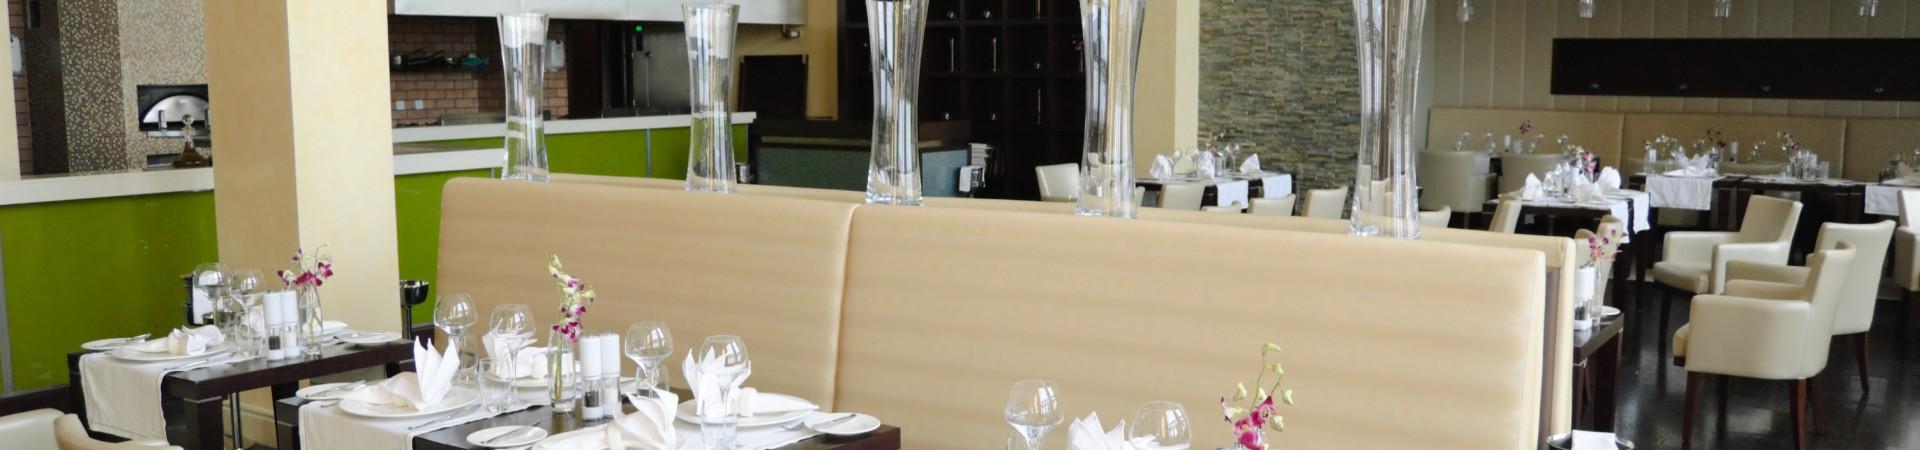 Gedekte tafel in restaurant